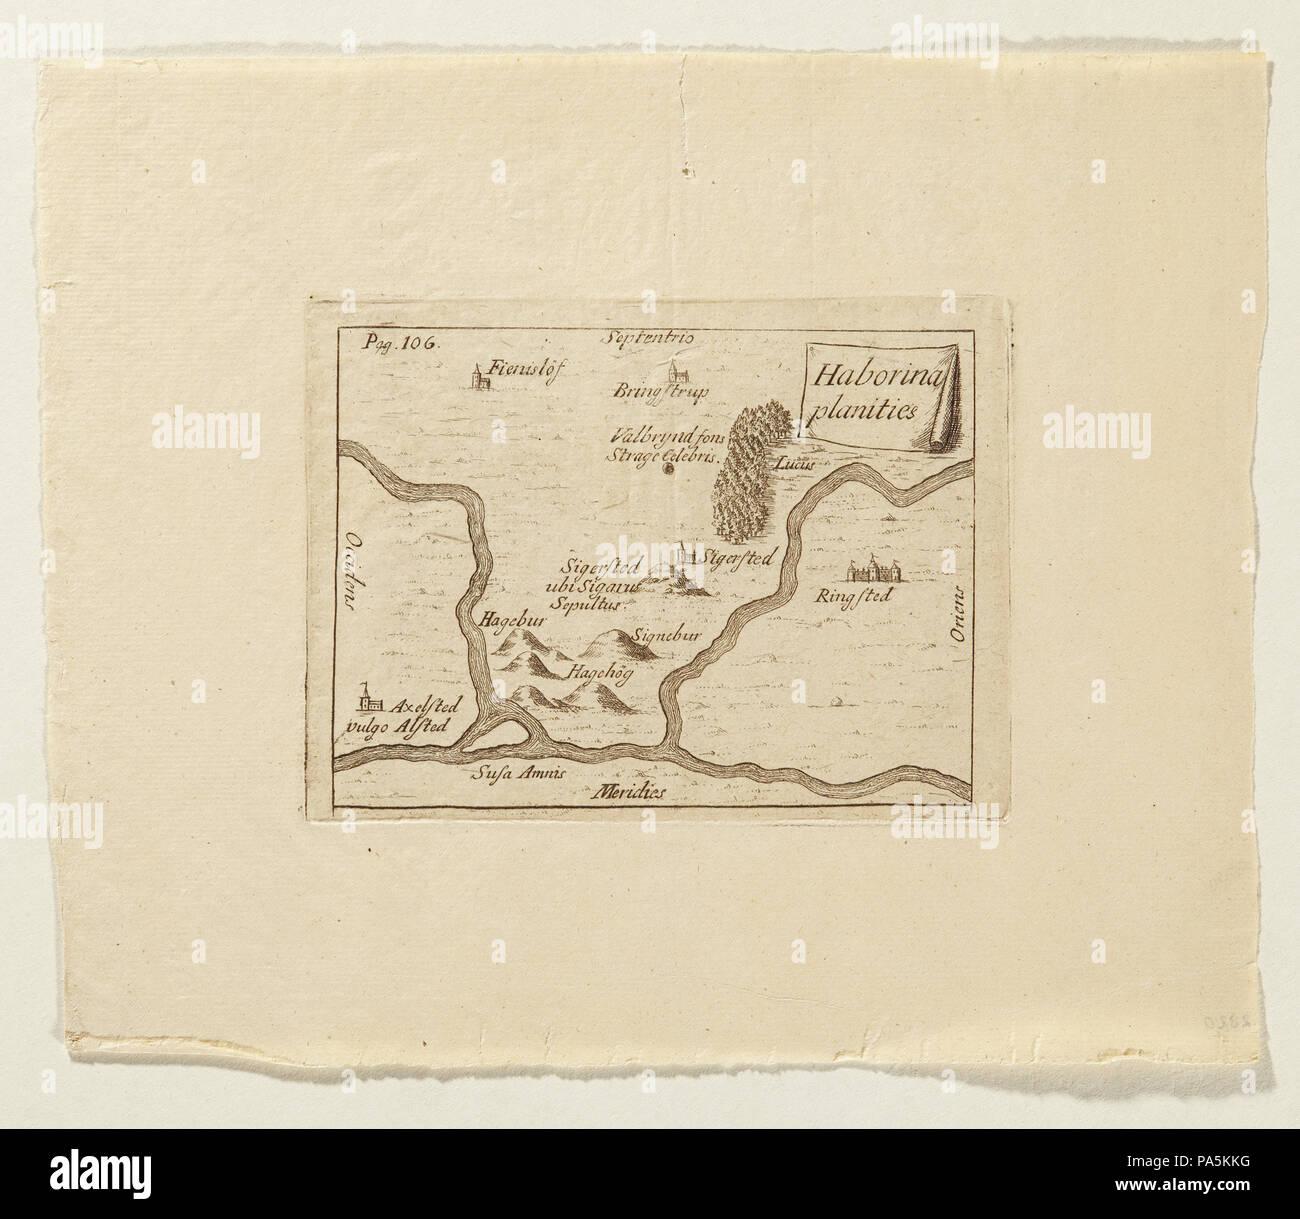 målöv danmark karta Ringsted Stock Photos & Ringsted Stock Images   Alamy målöv danmark karta